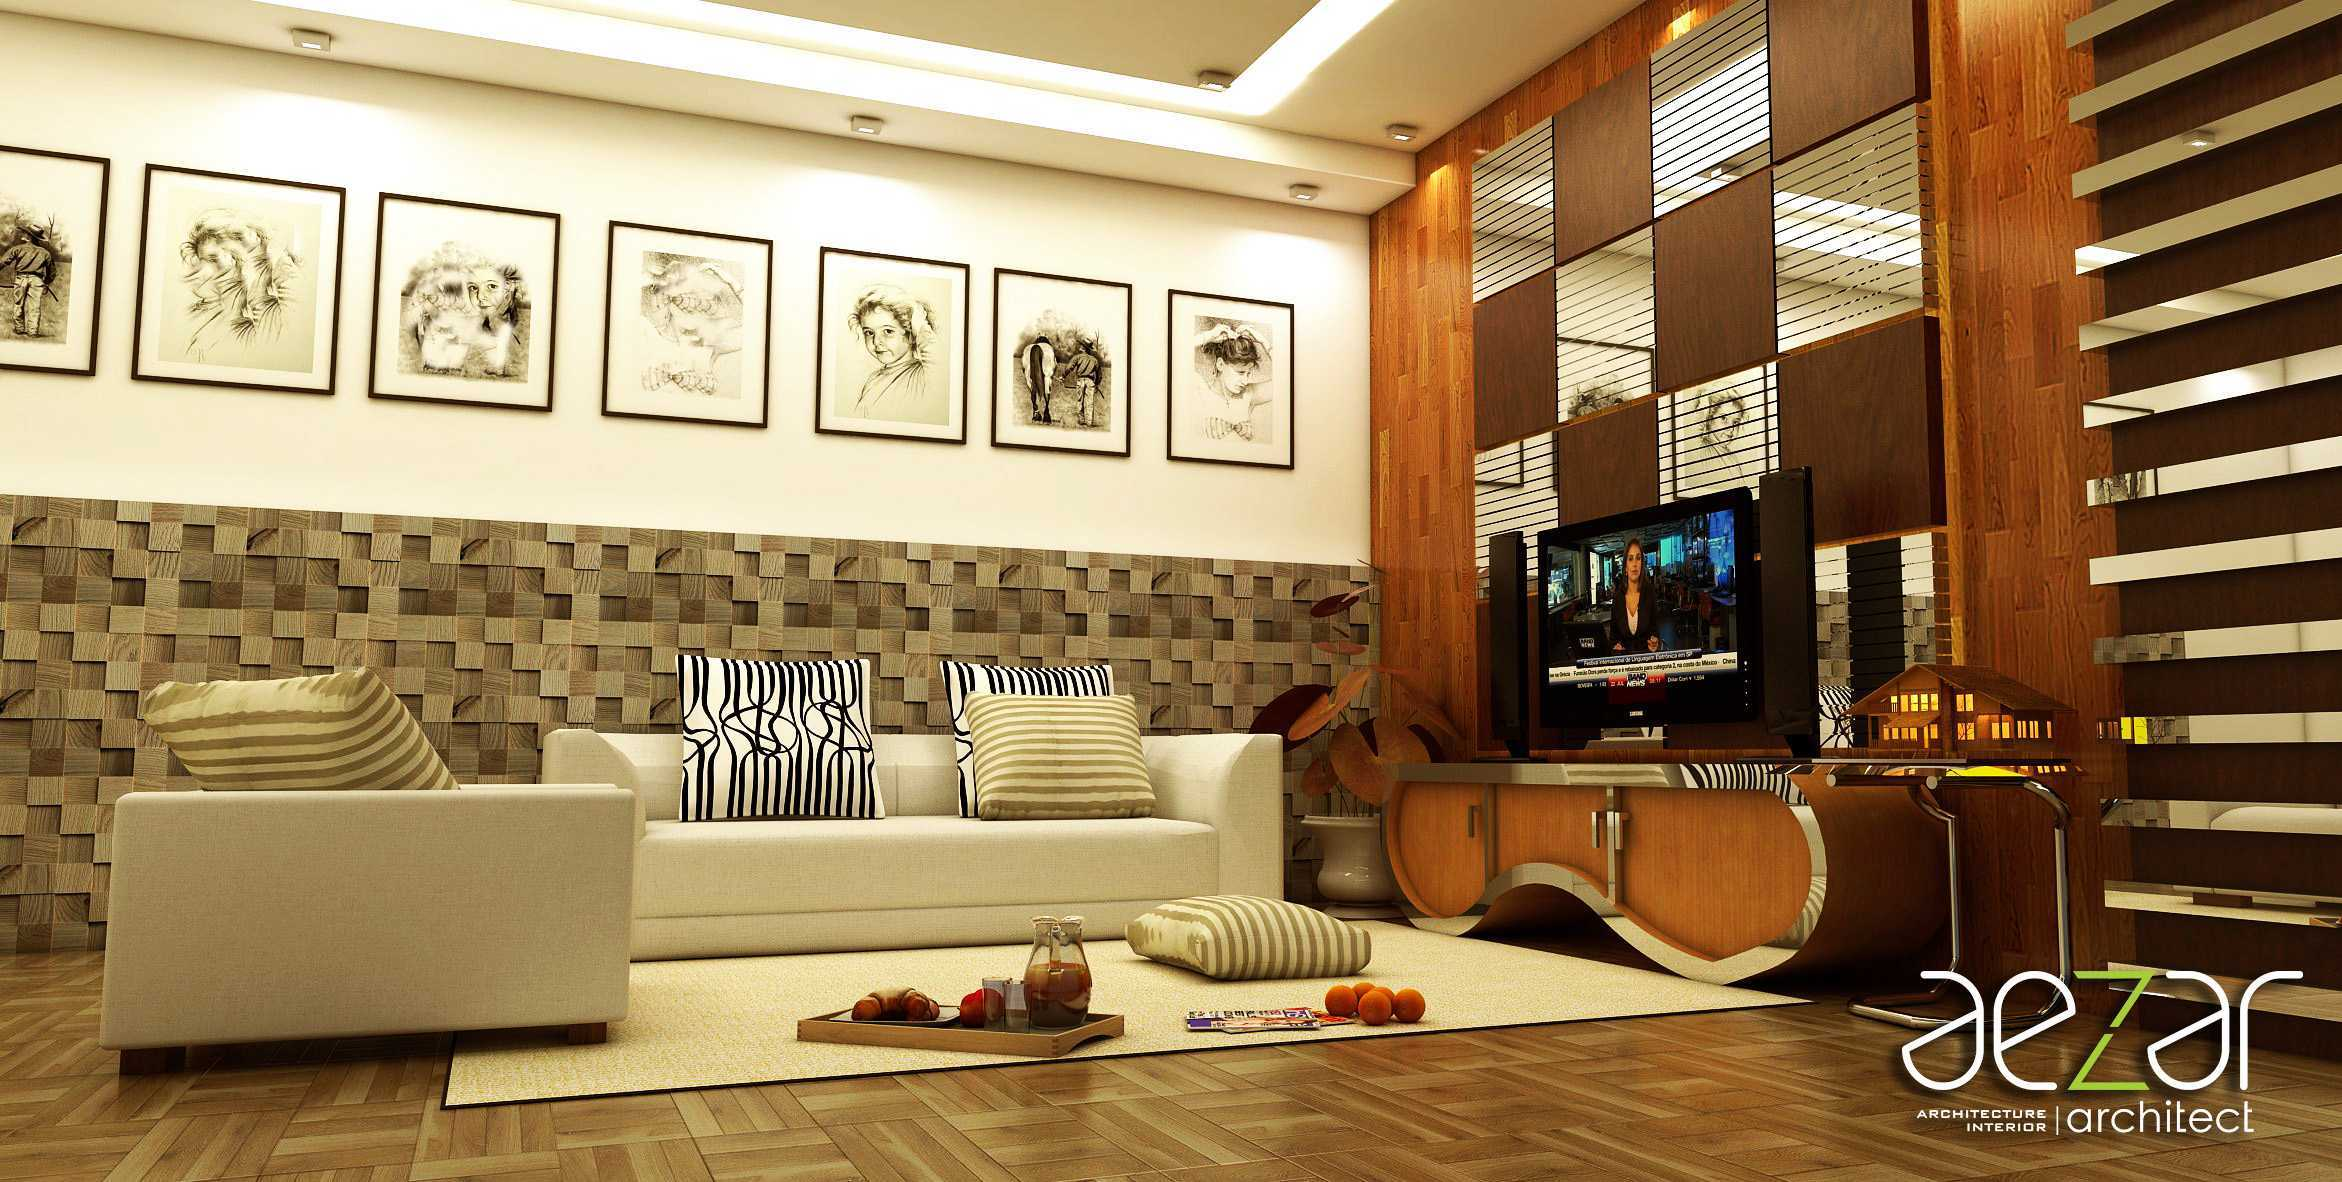 Aezar Architect Ks House Kabupaten Sleman, Daerah Istimewa Yogyakarta, Indonesia Kabupaten Sleman, Daerah Istimewa Yogyakarta, Indonesia Family Room   54464